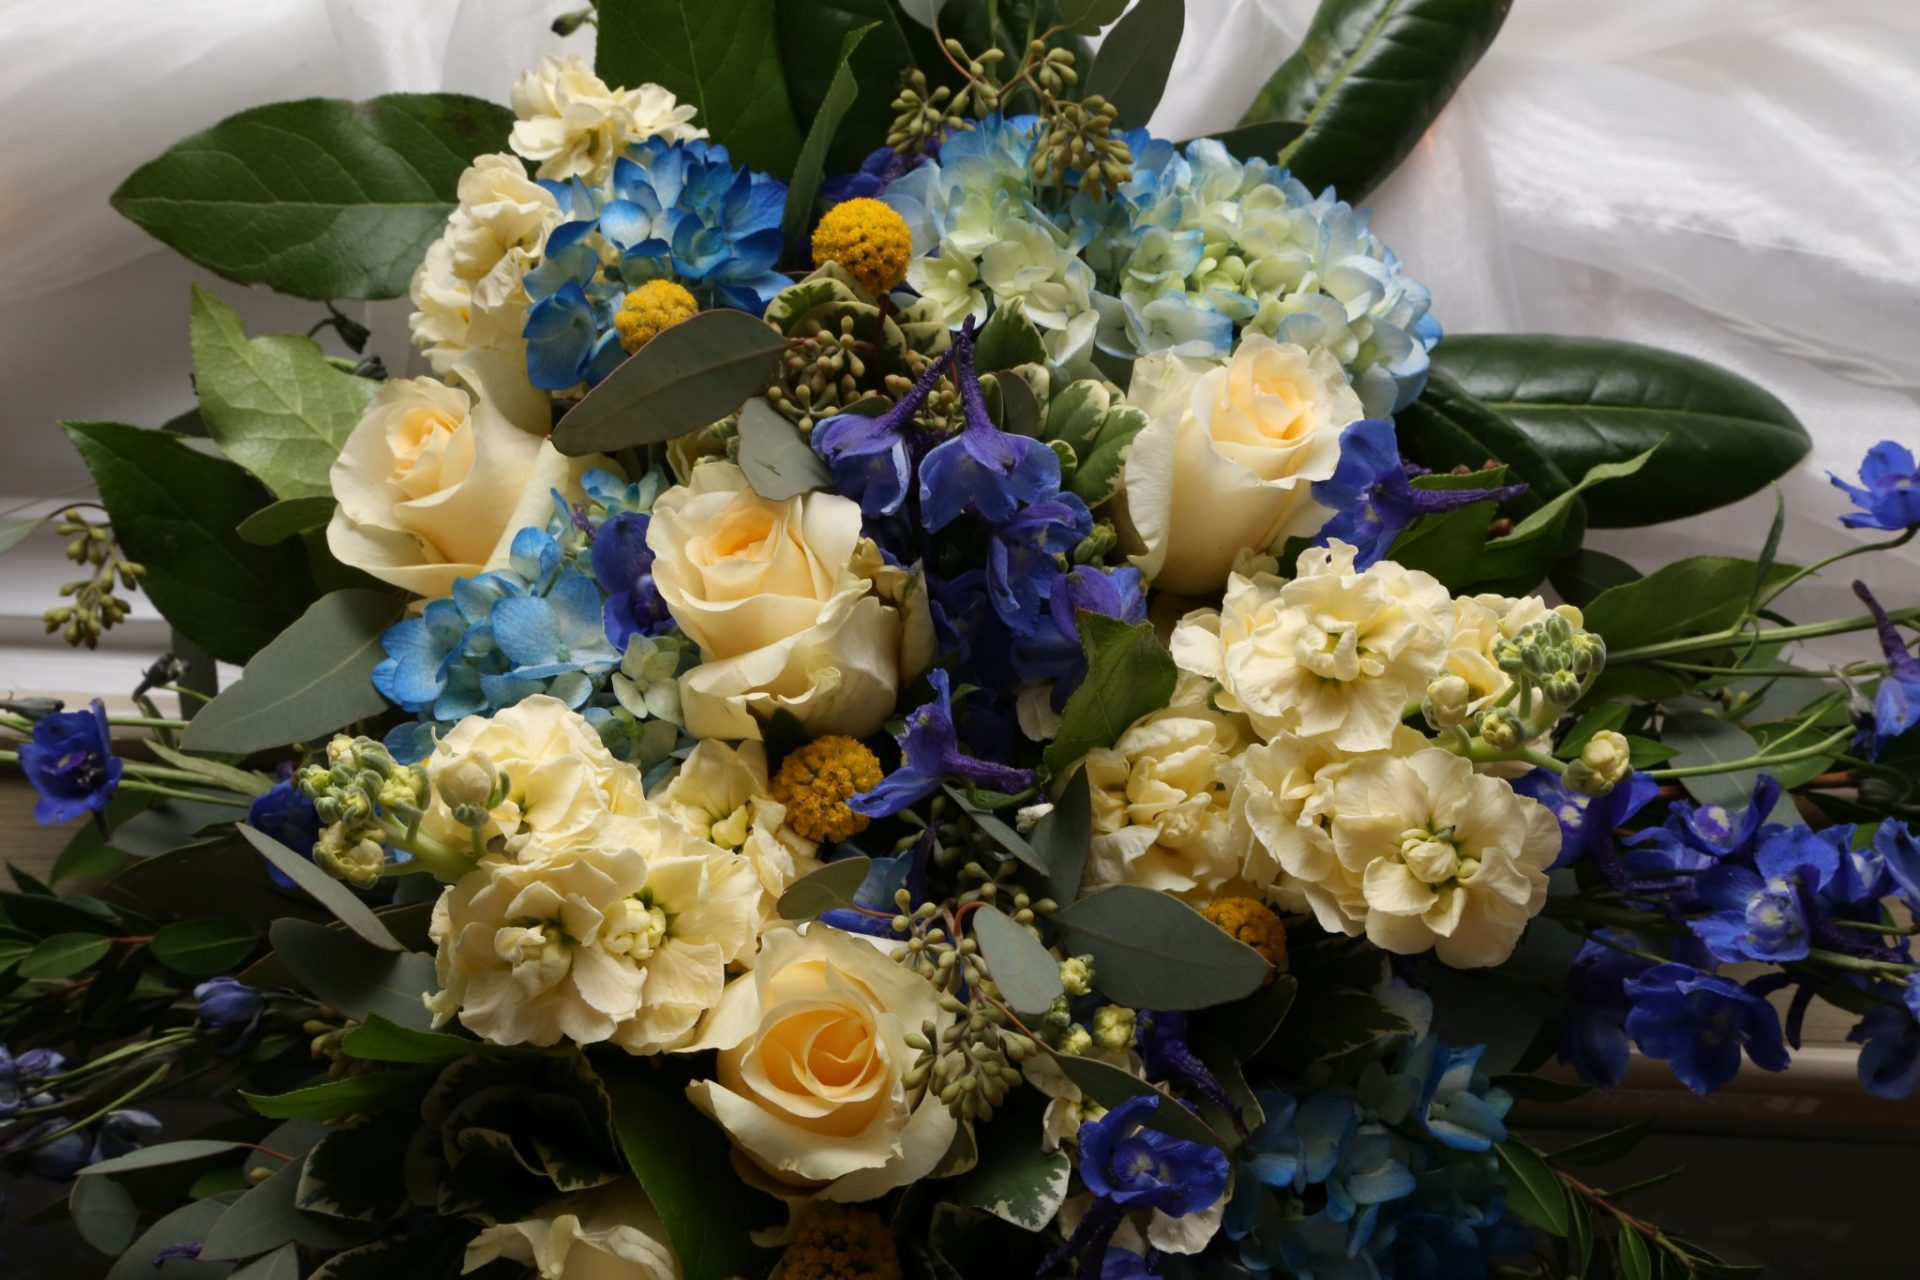 Yellow, blue and purple wedding flowers